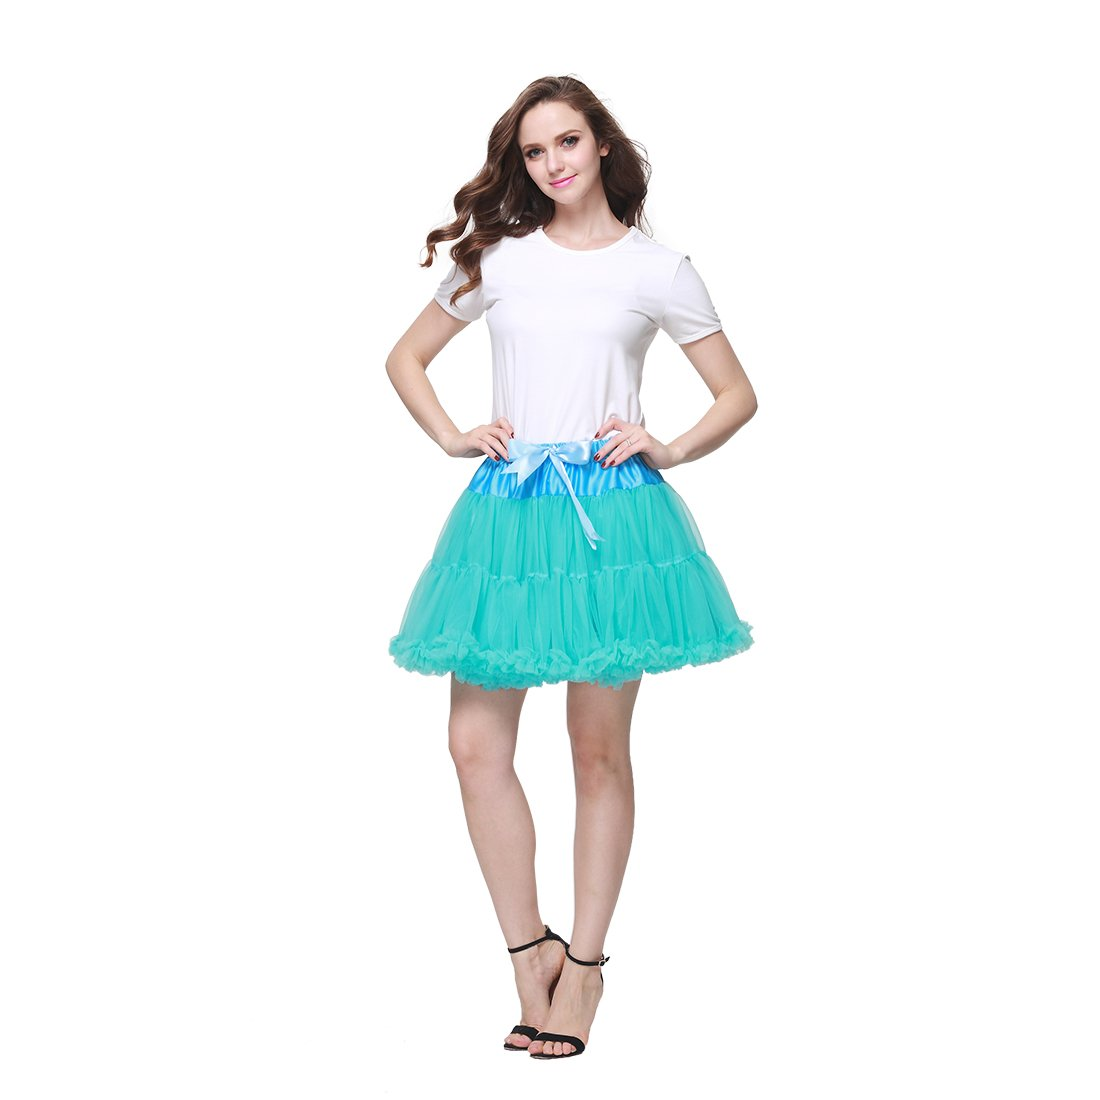 Buenos ninos Damen Plissee Rock, Einfarbig 90 DEN B01I4ZVSY4 Röcke Marke